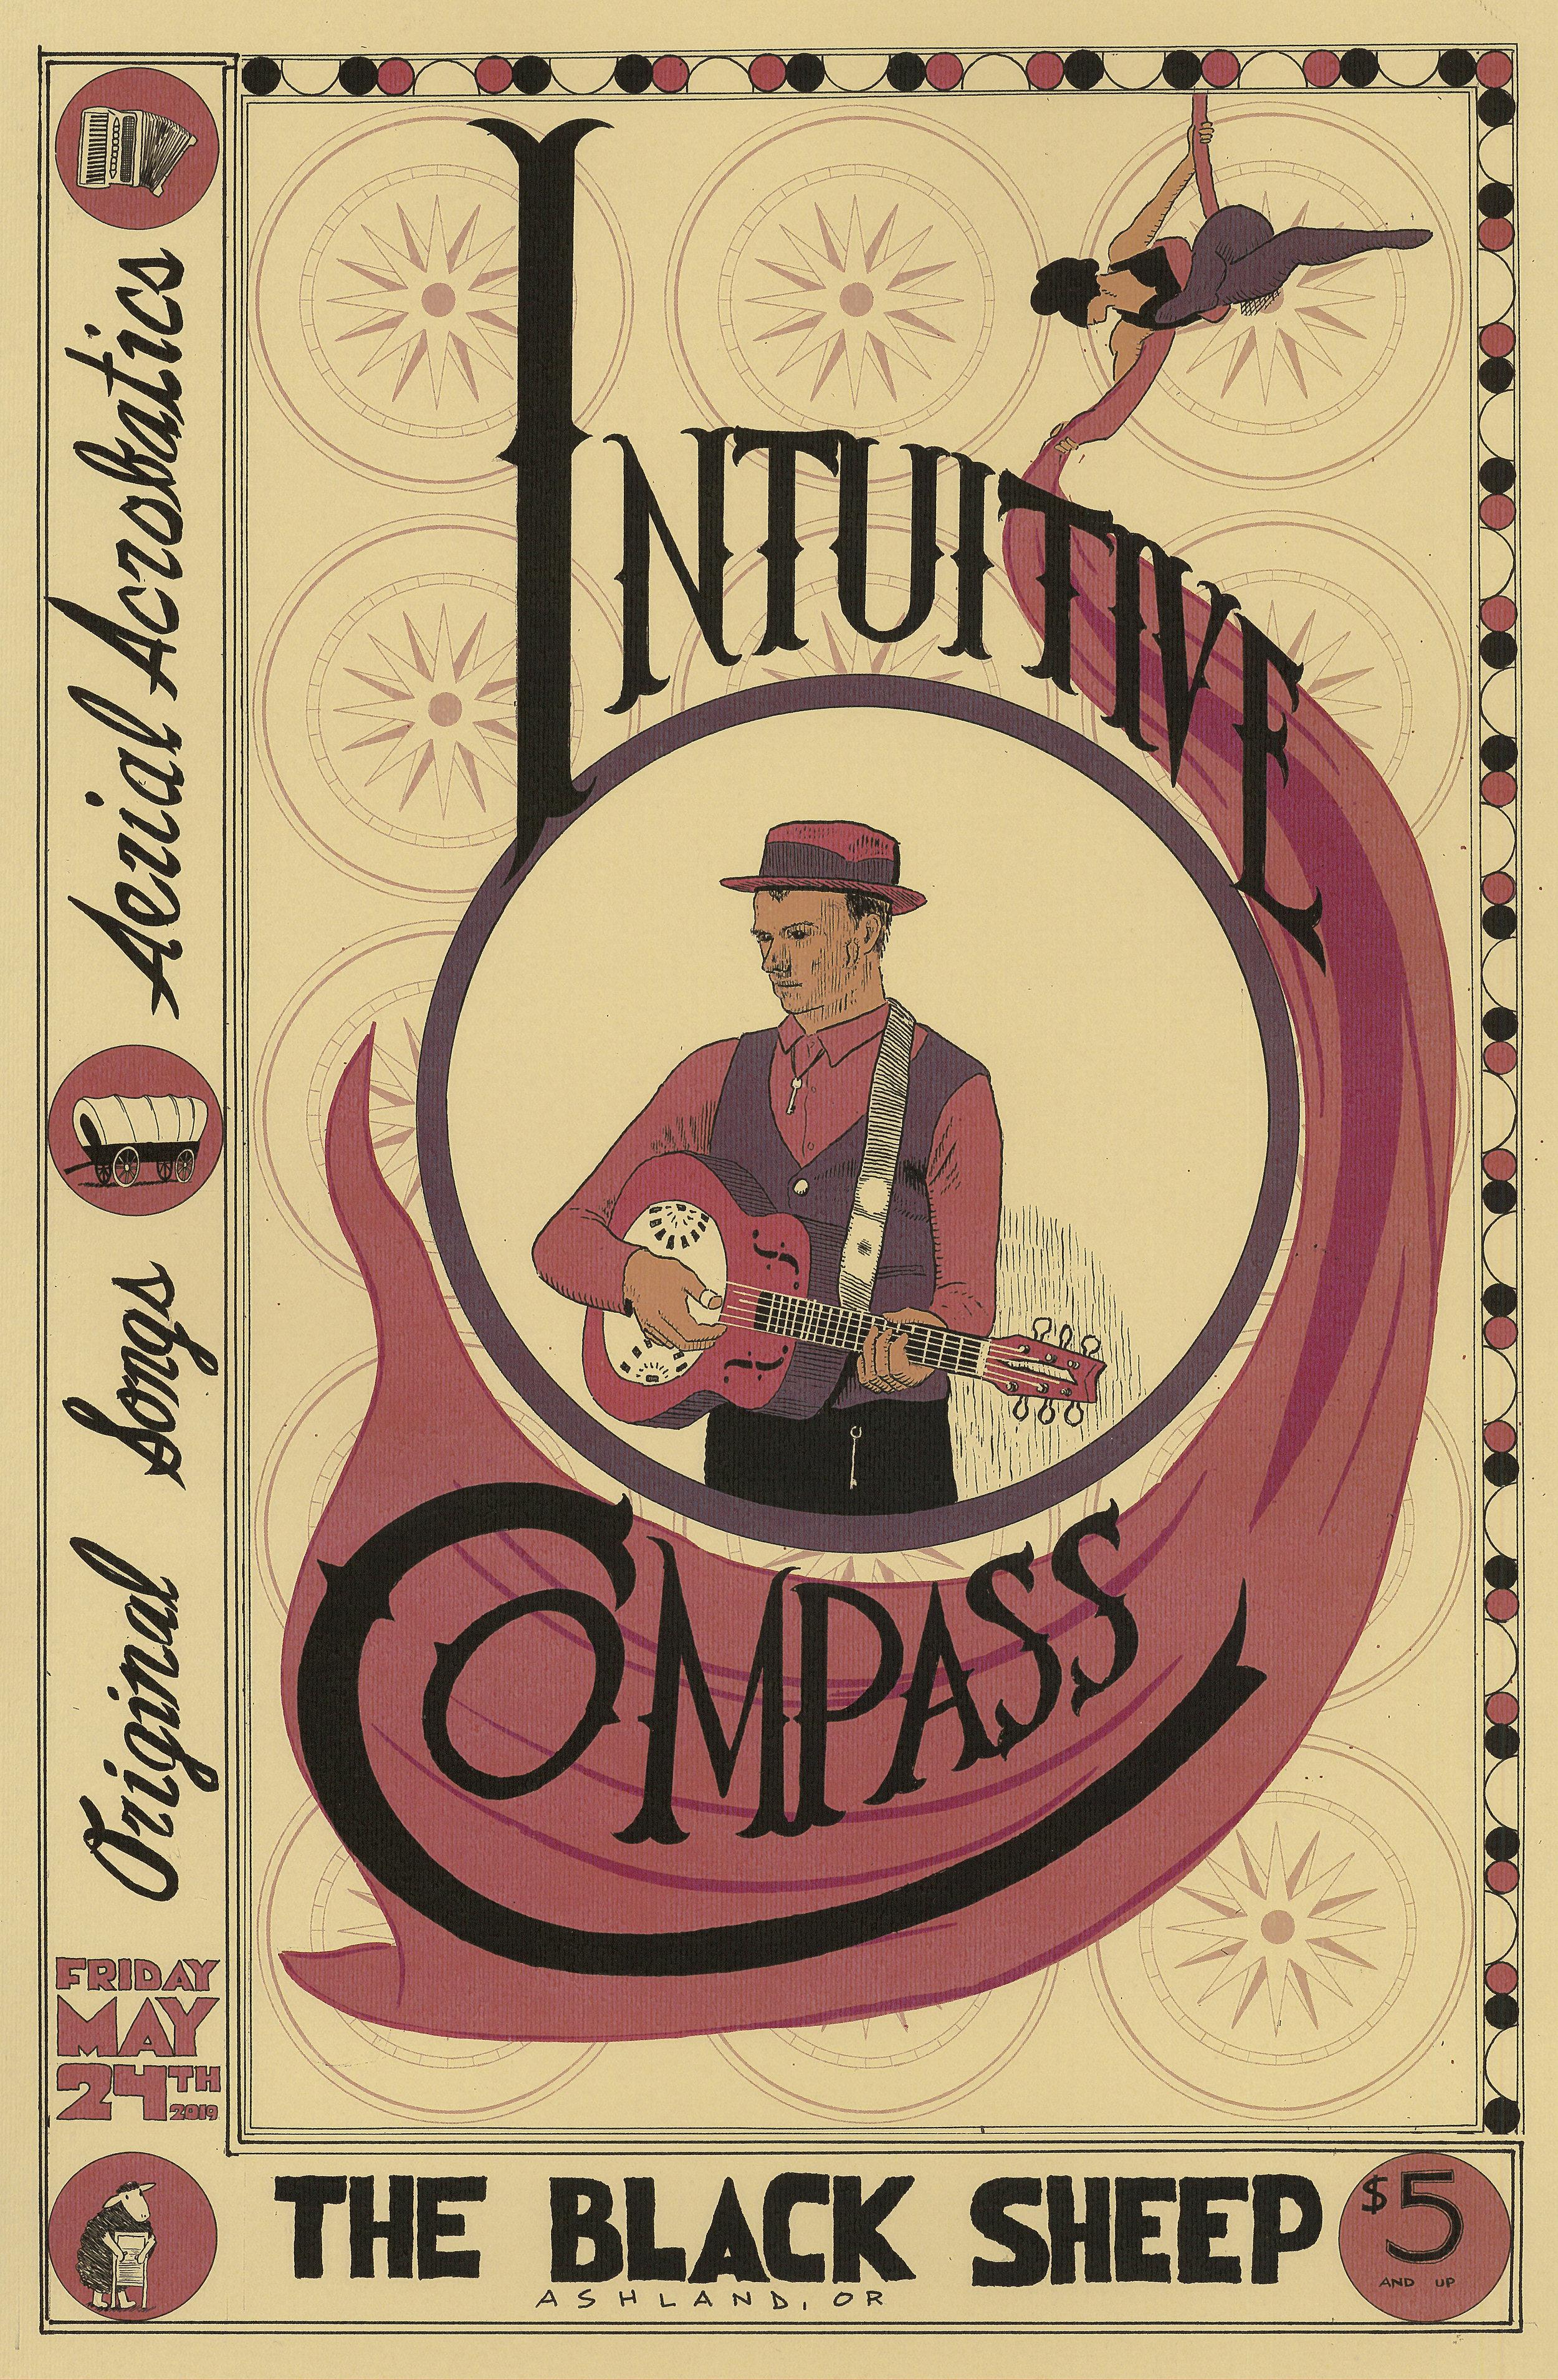 IntuitiveCompass5-24-2019rbg.jpg